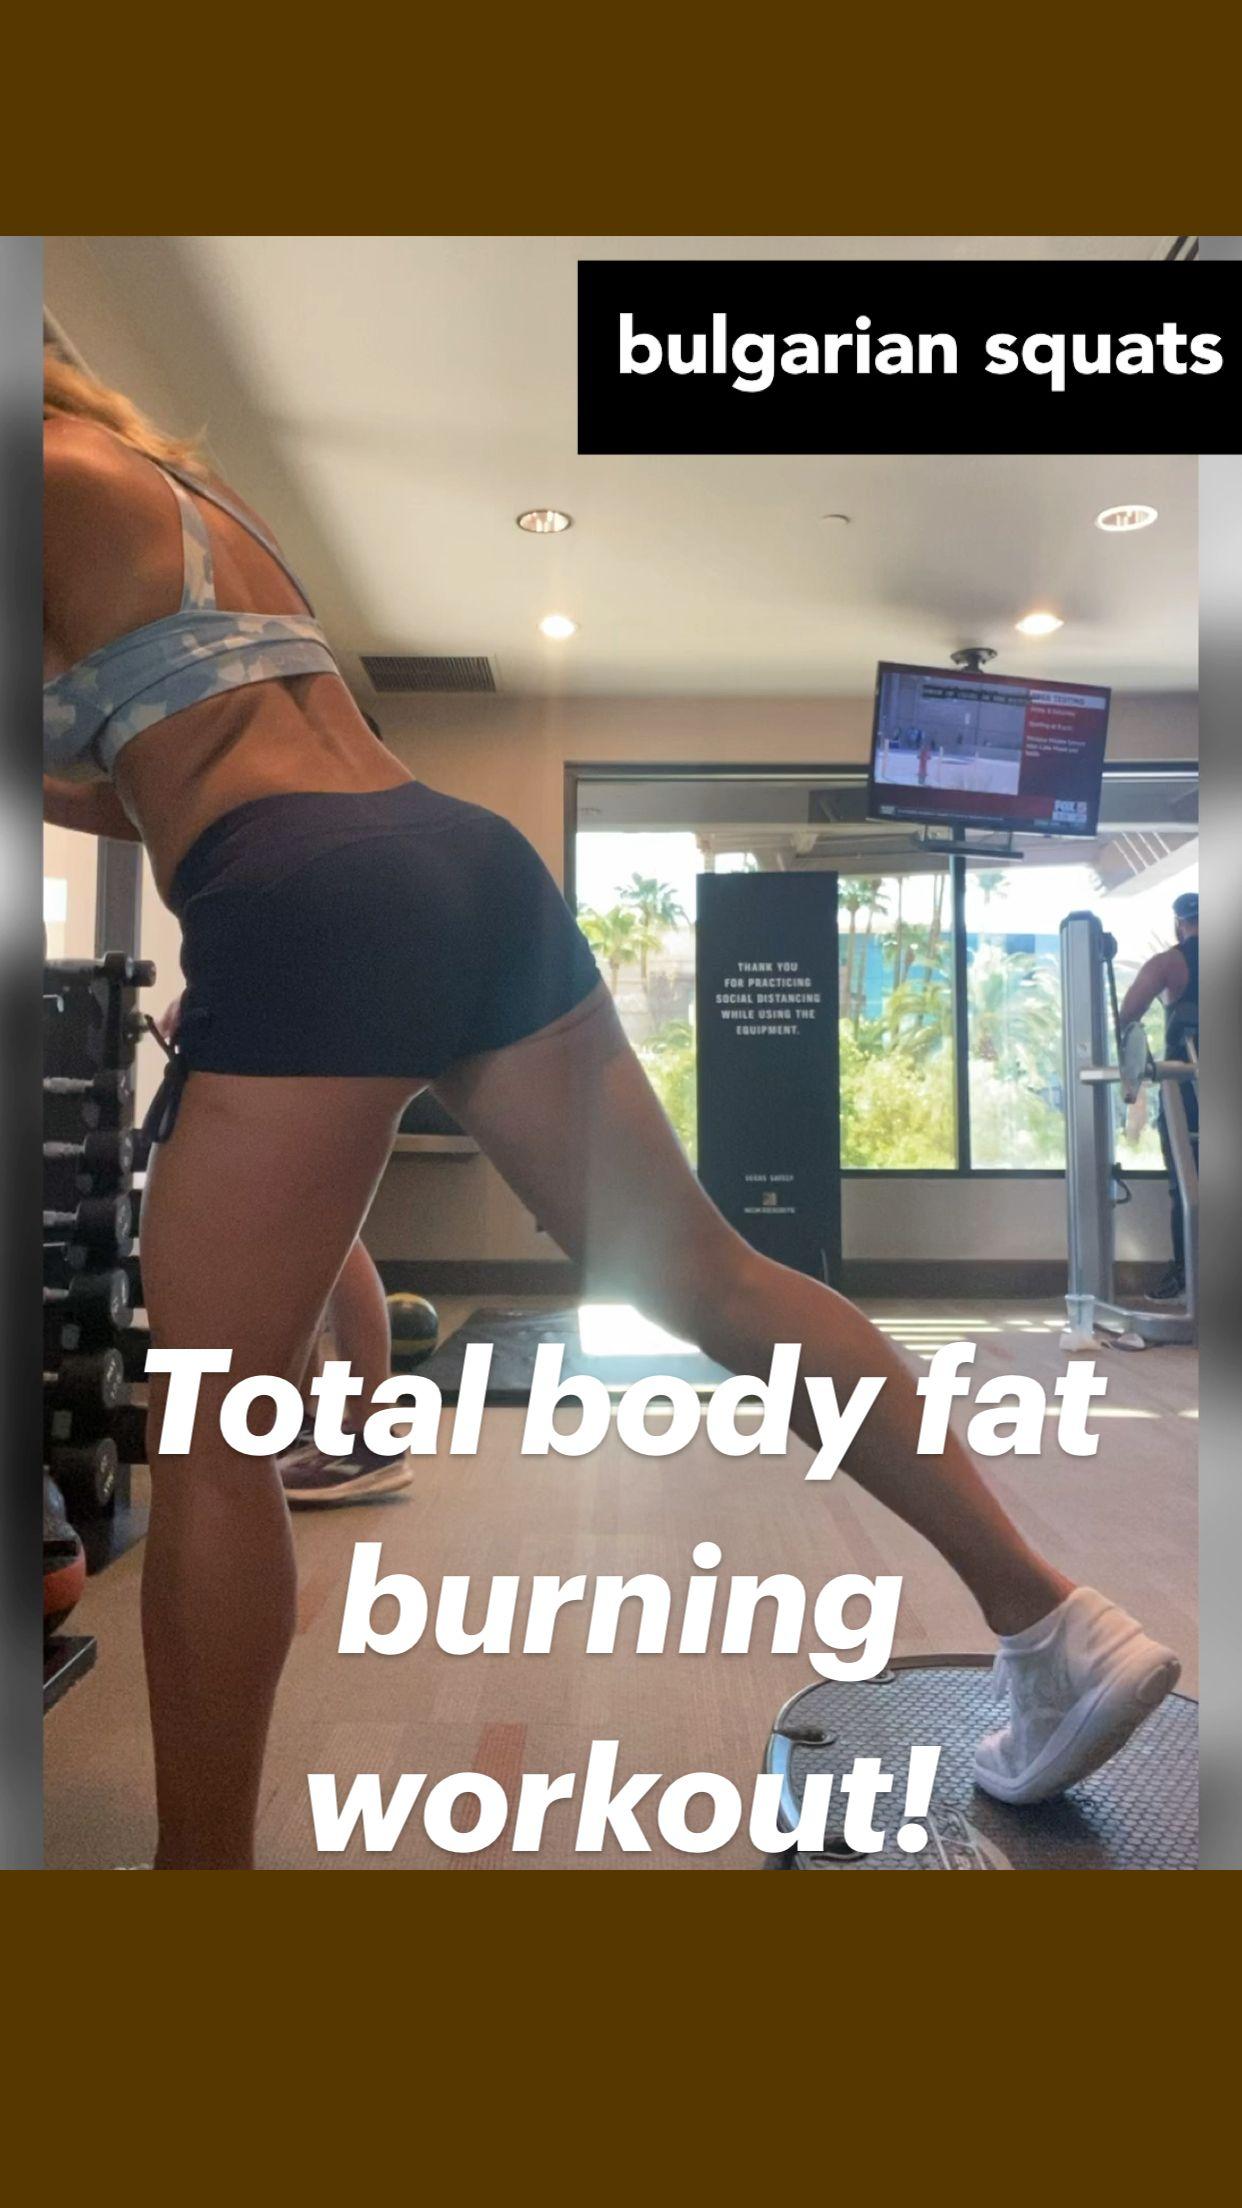 Total body fat burning workout!